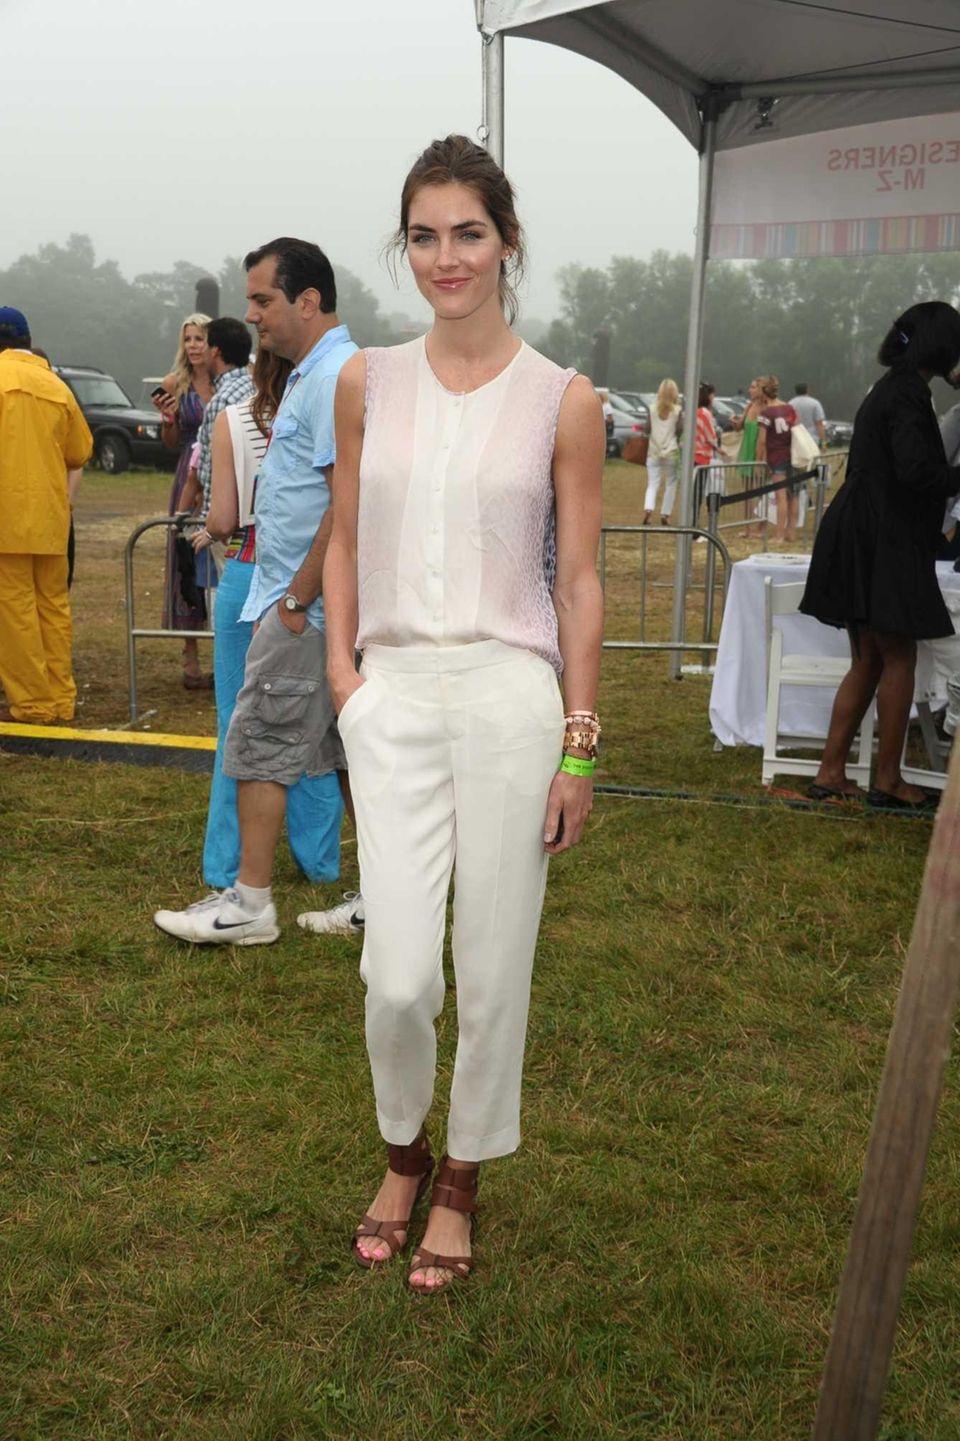 Model Hilary Rhoda attends Super Saturday 15 to